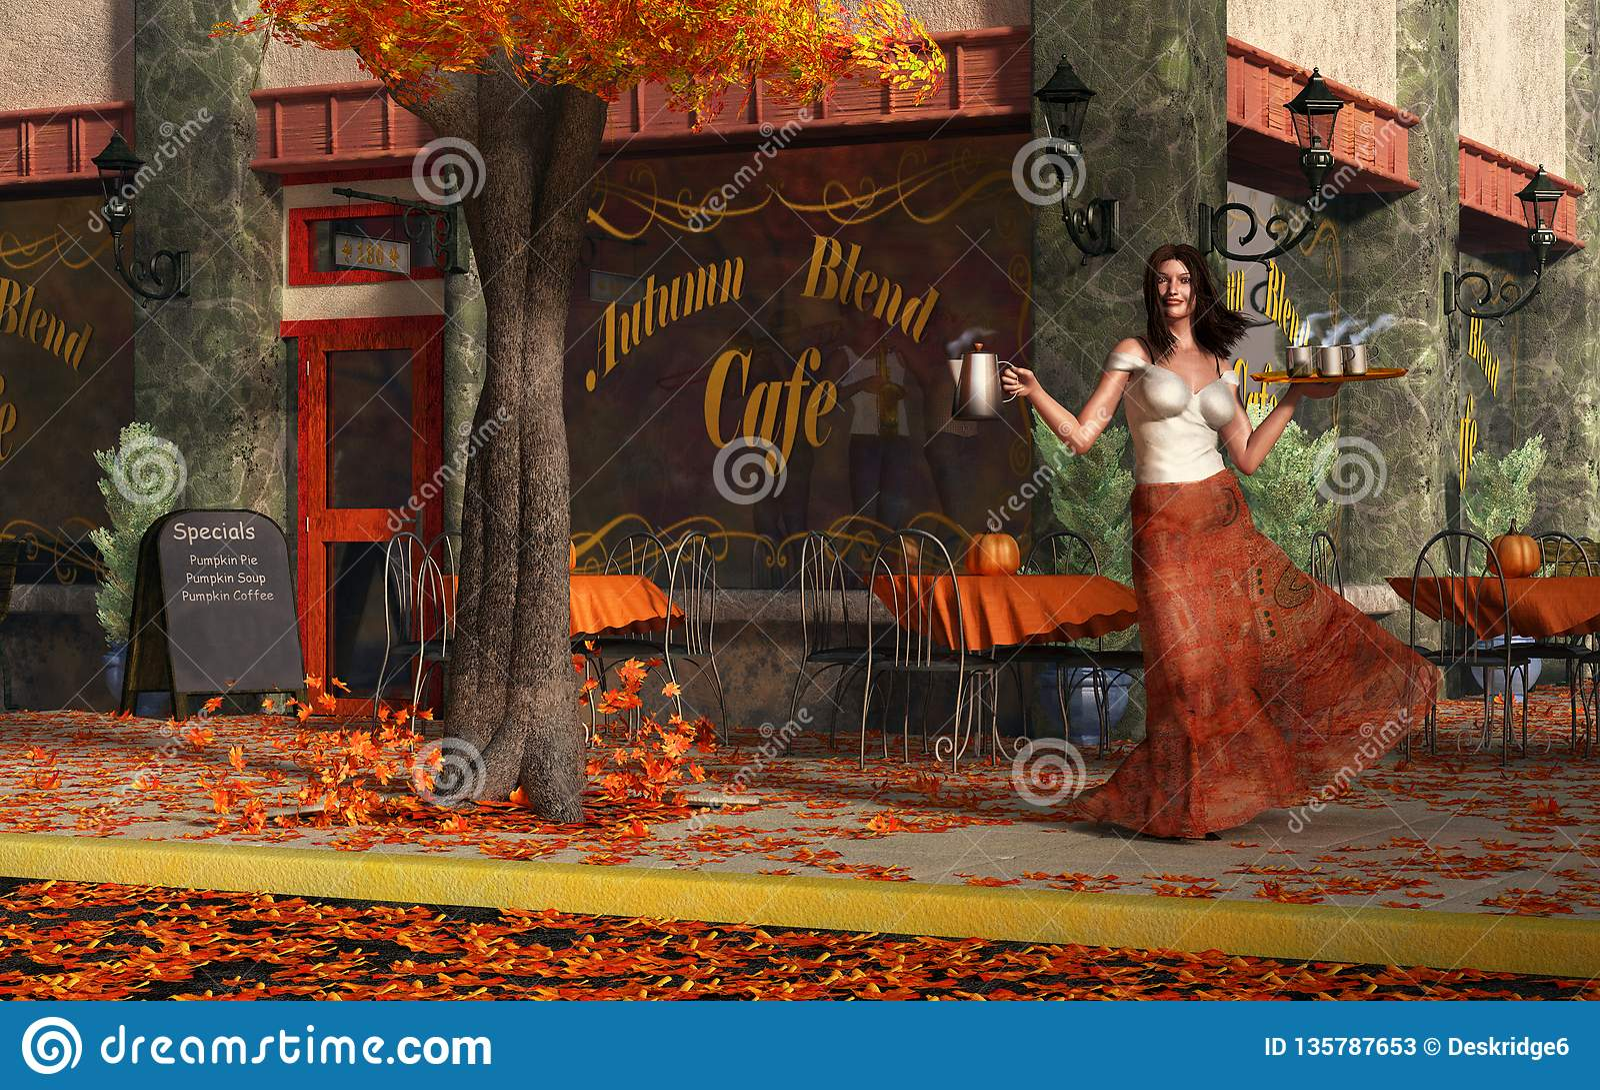 Autumn Roast Cafe